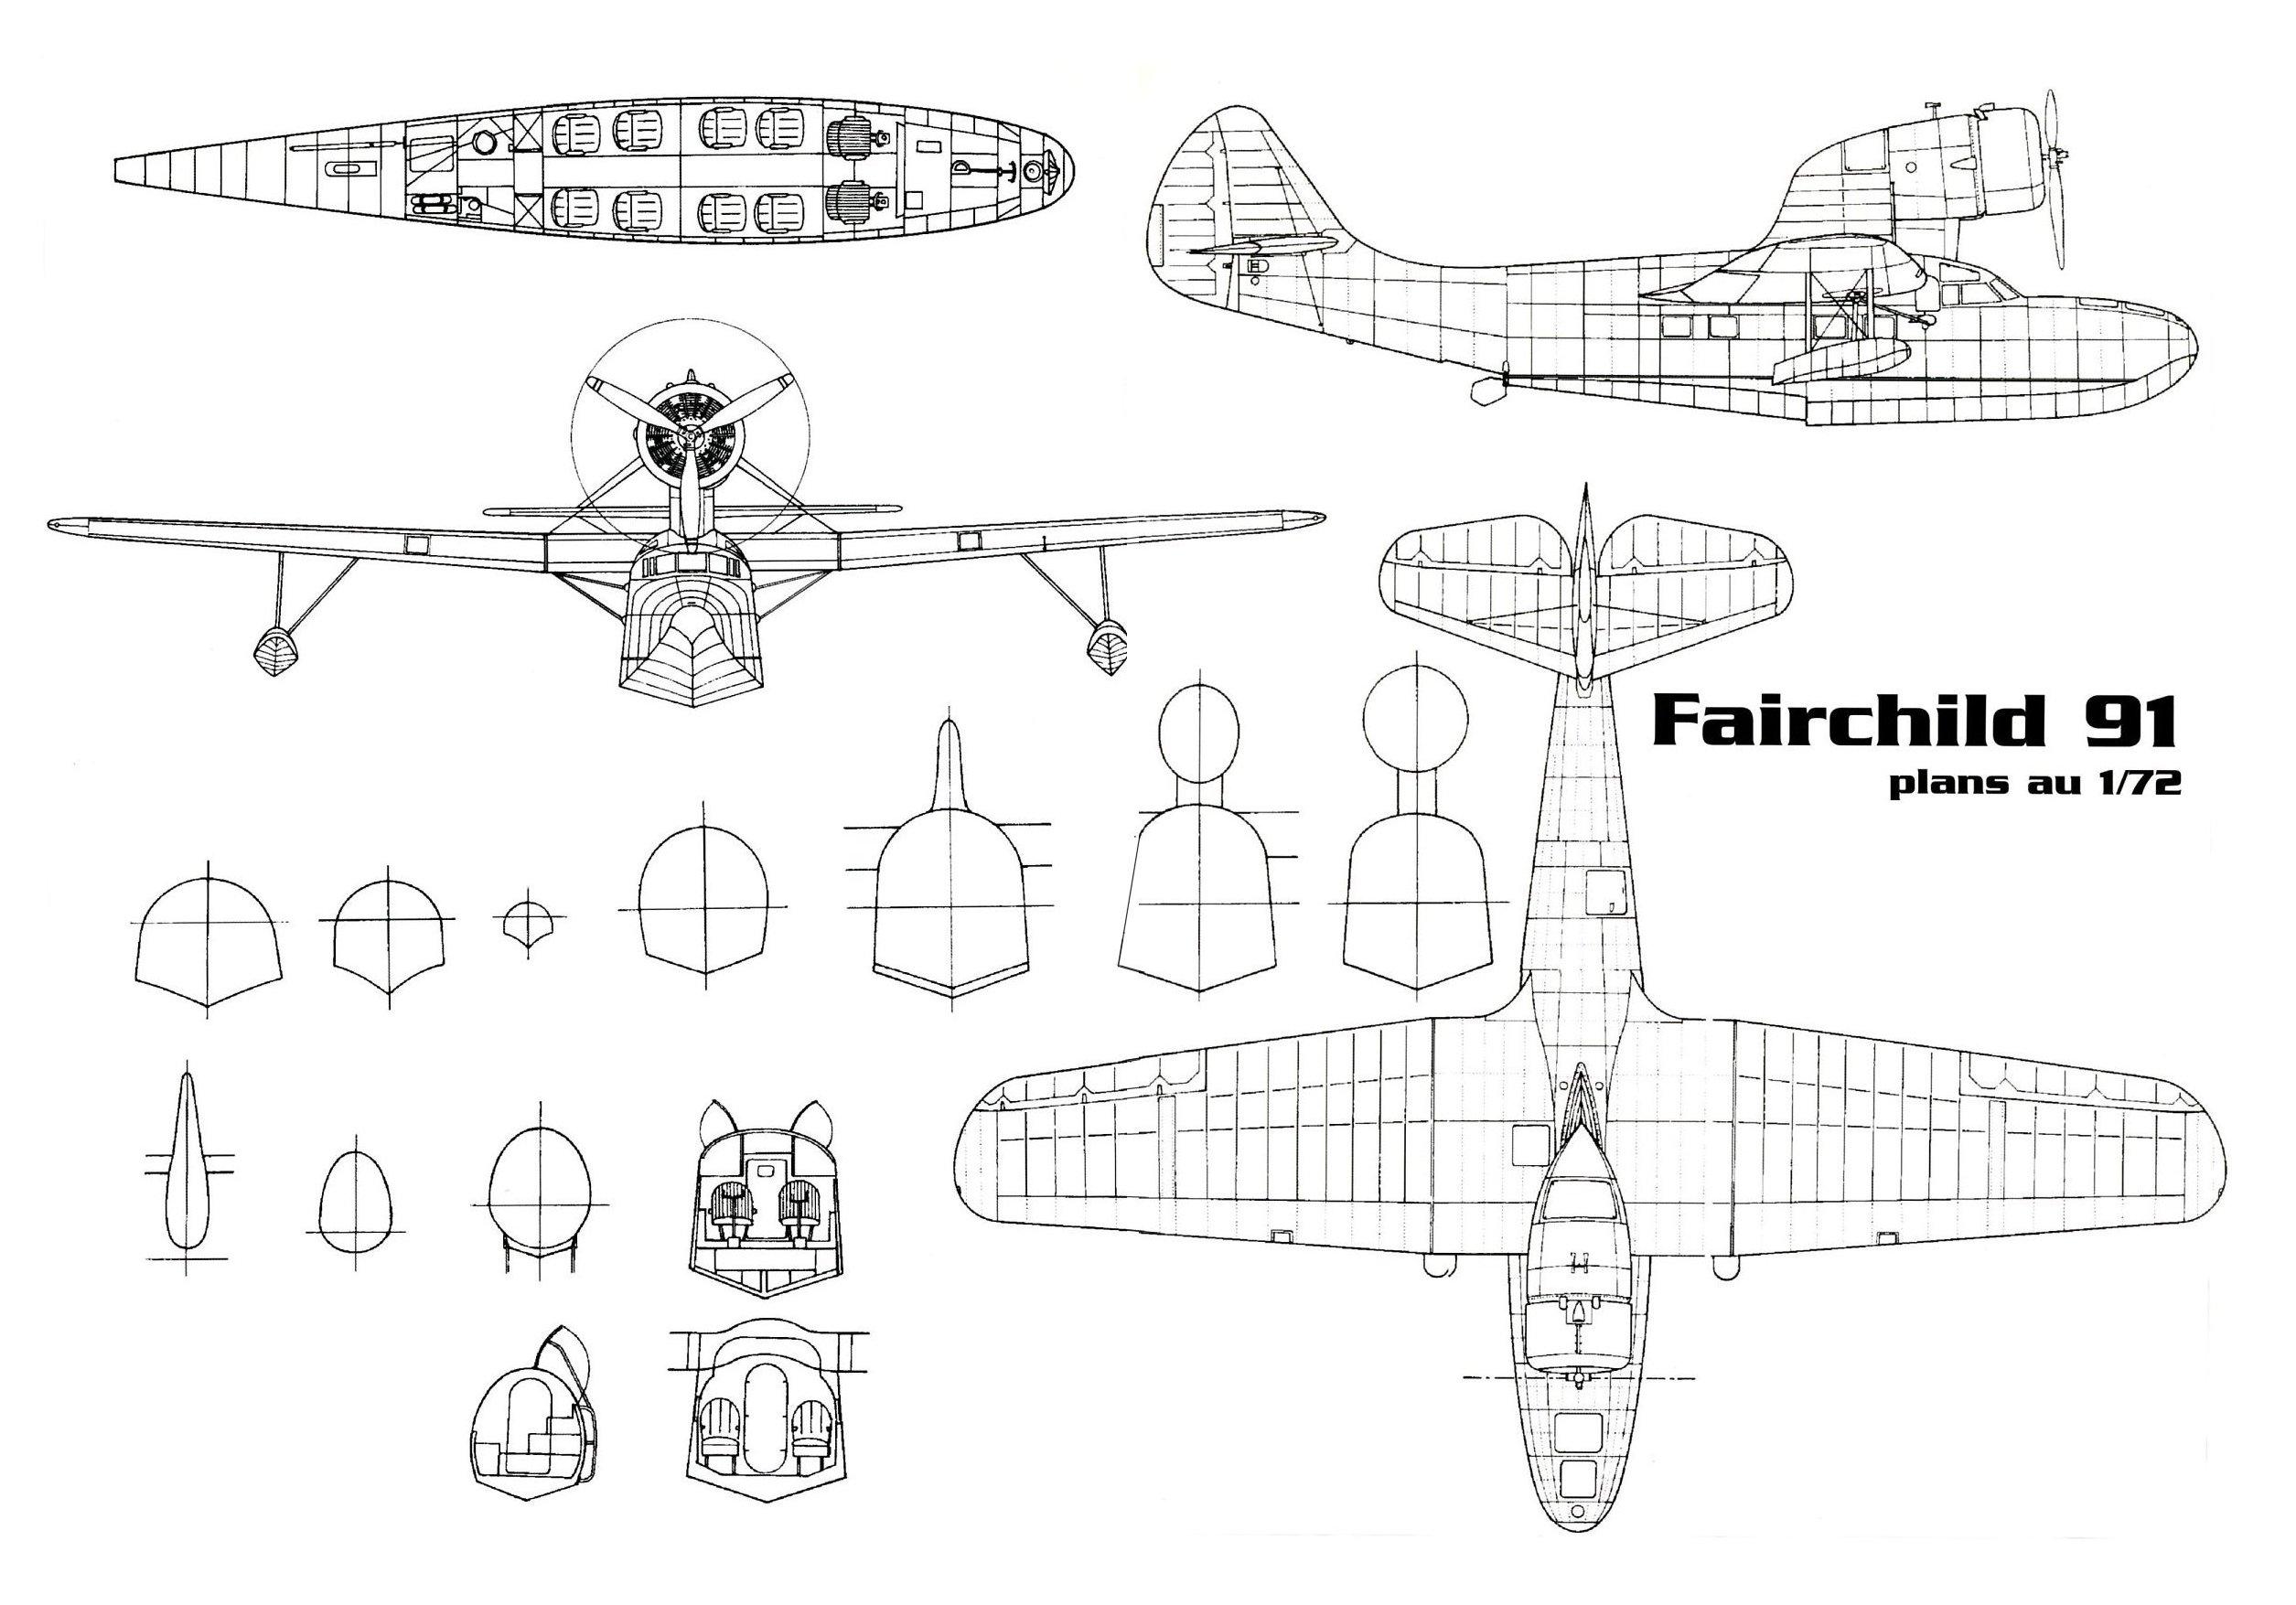 Fairchild 91 blueprints